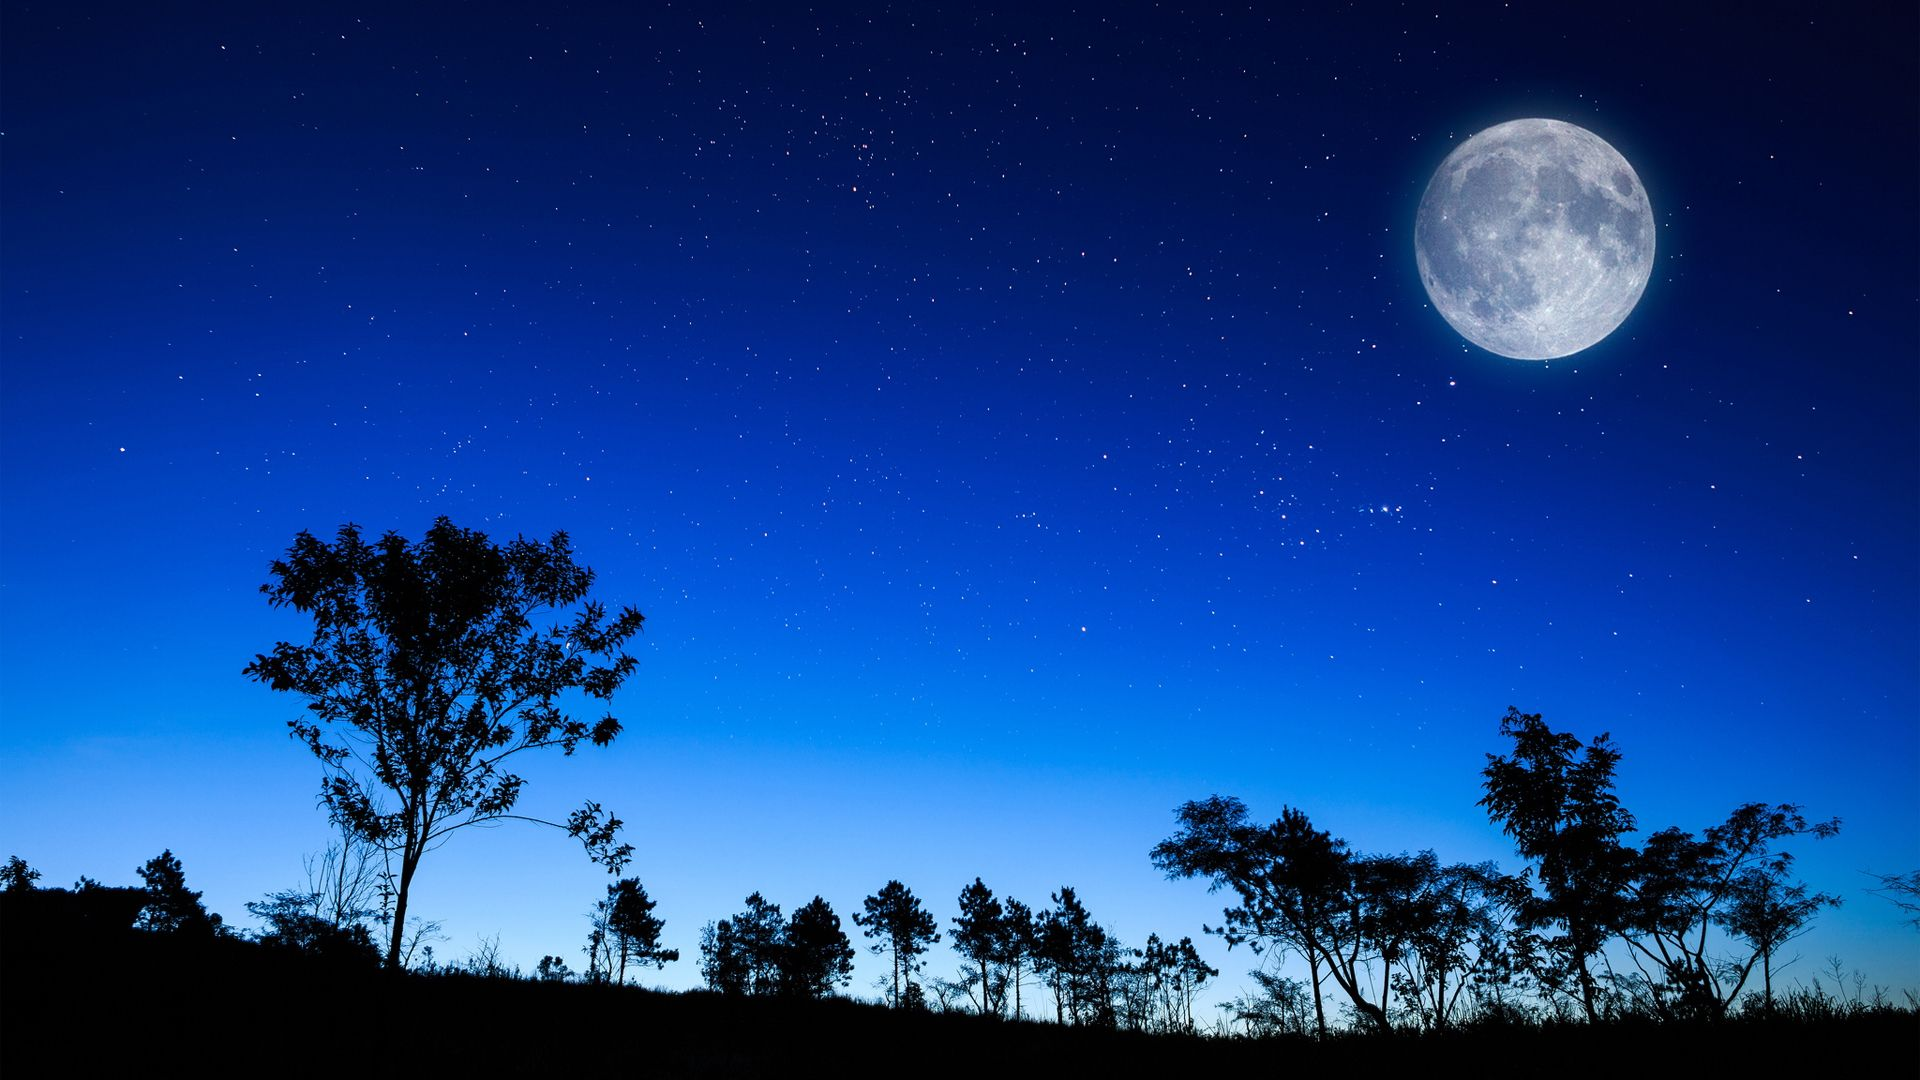 Cool Hd Wallpaper Night Full Moon And Beautiful Blue Sky Night Sky Moon Moon And Stars Wallpaper Sunrise Landscape